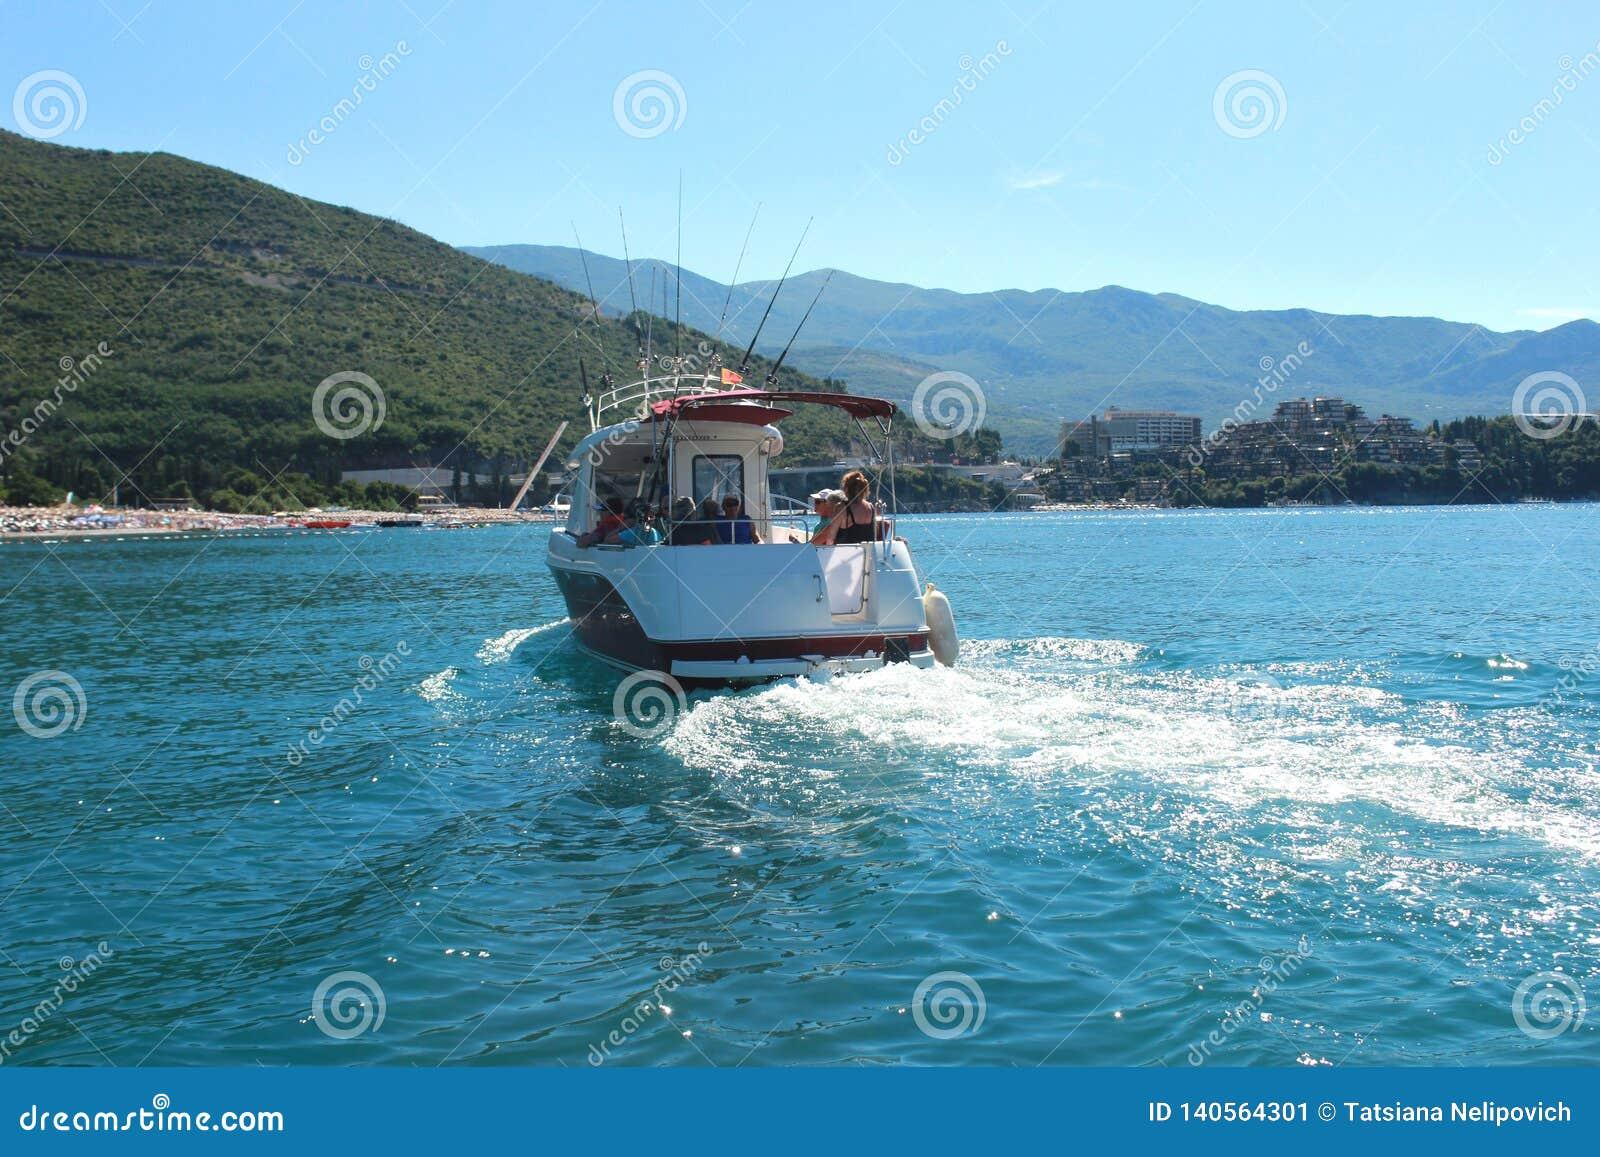 Budva Montenegro - 24.07.2018. Editorial. Speedboat sailing in sea